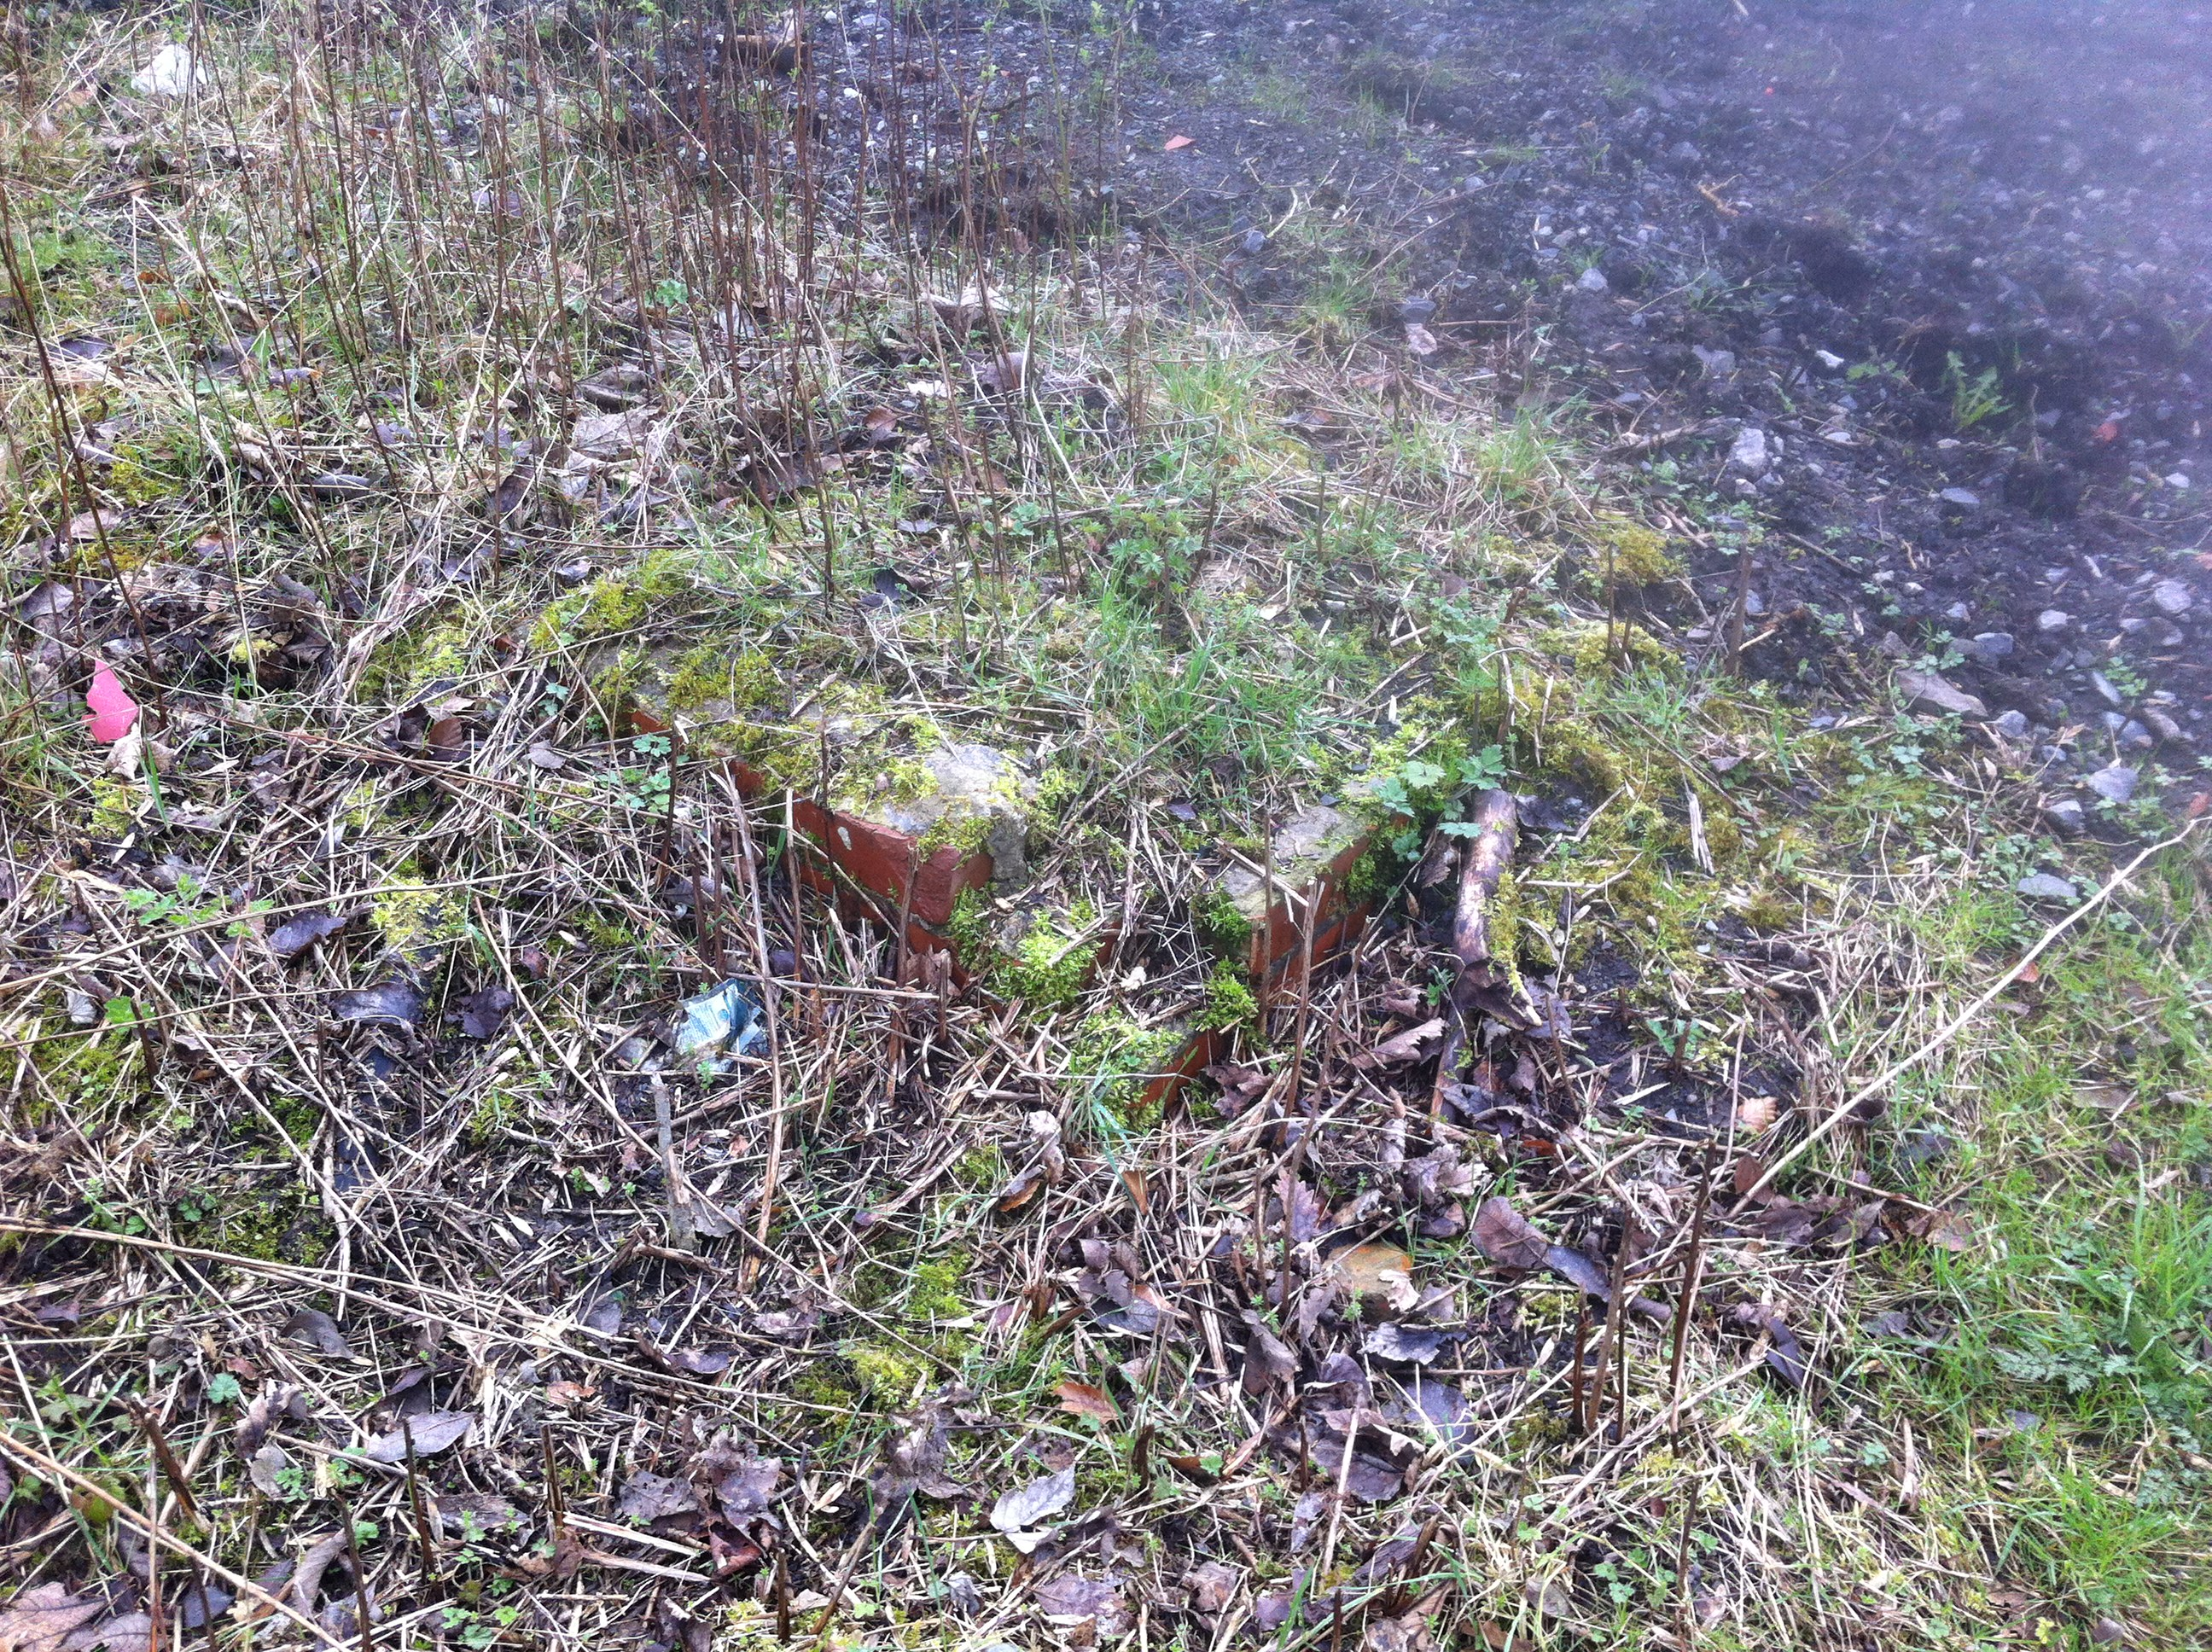 Remains of the base of Beamish Signal Box